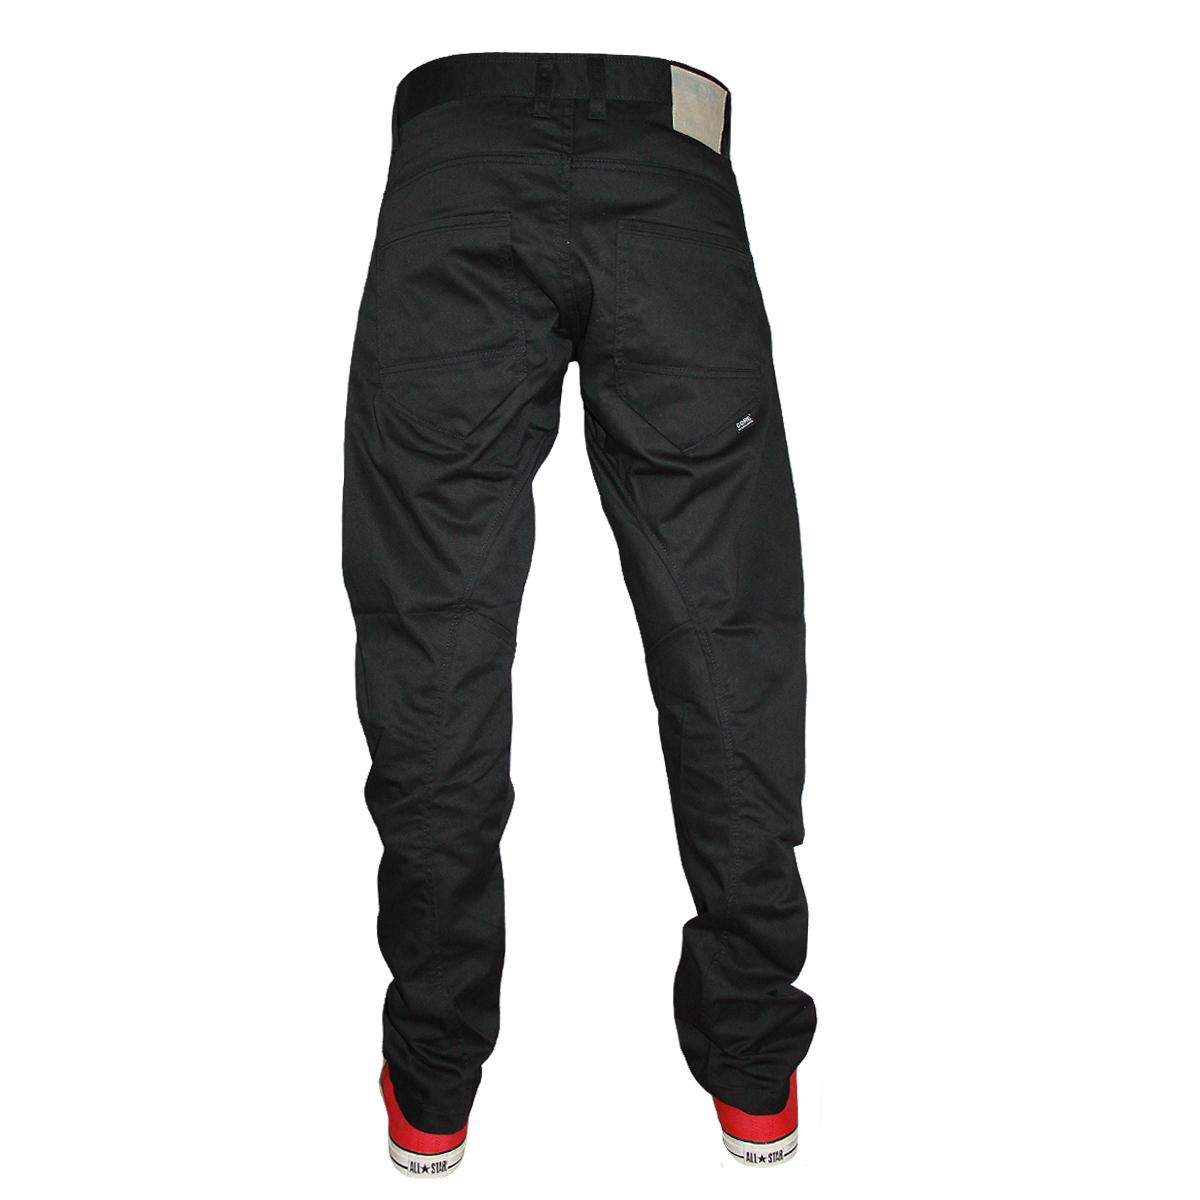 mens black jack jones jeans dale colin twist chino pants. Black Bedroom Furniture Sets. Home Design Ideas